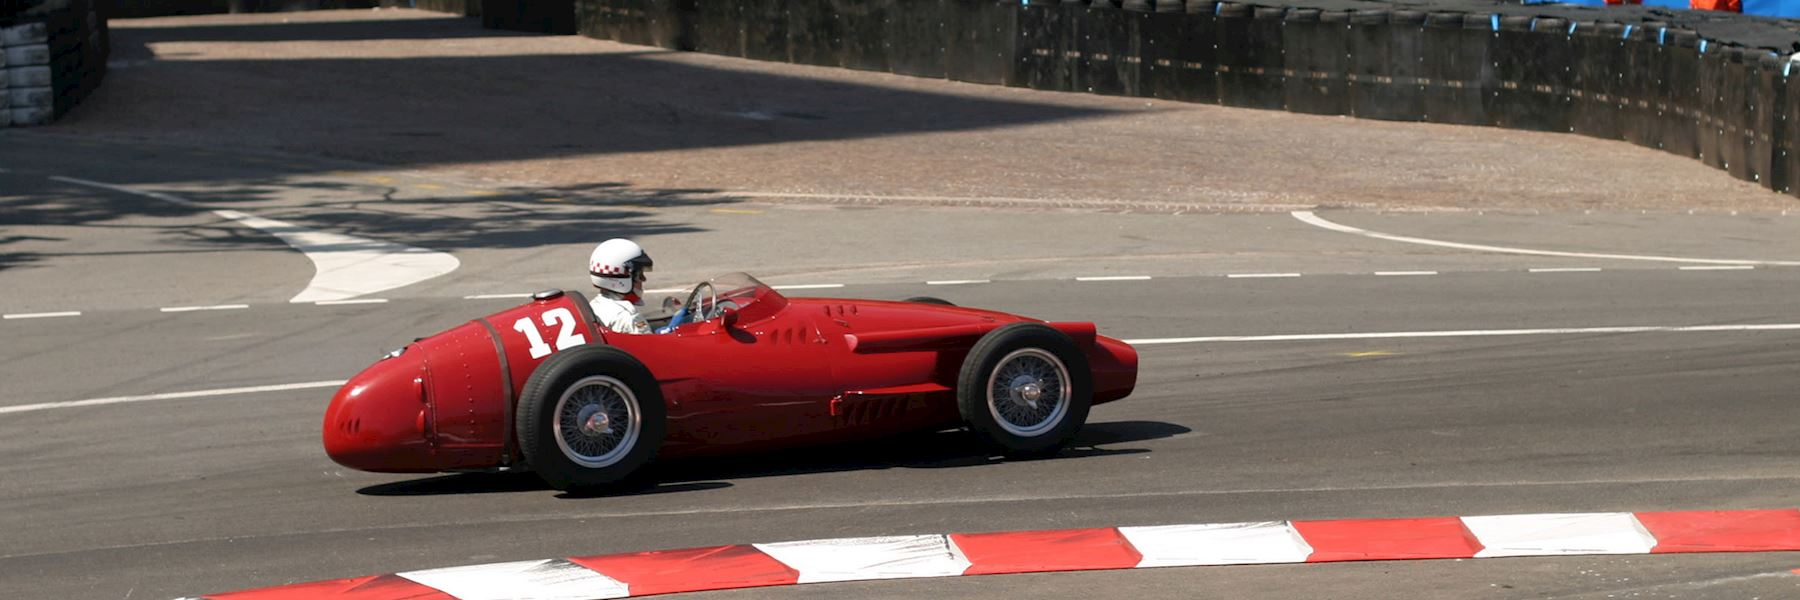 Visit Monaco and Monte Carlo, France